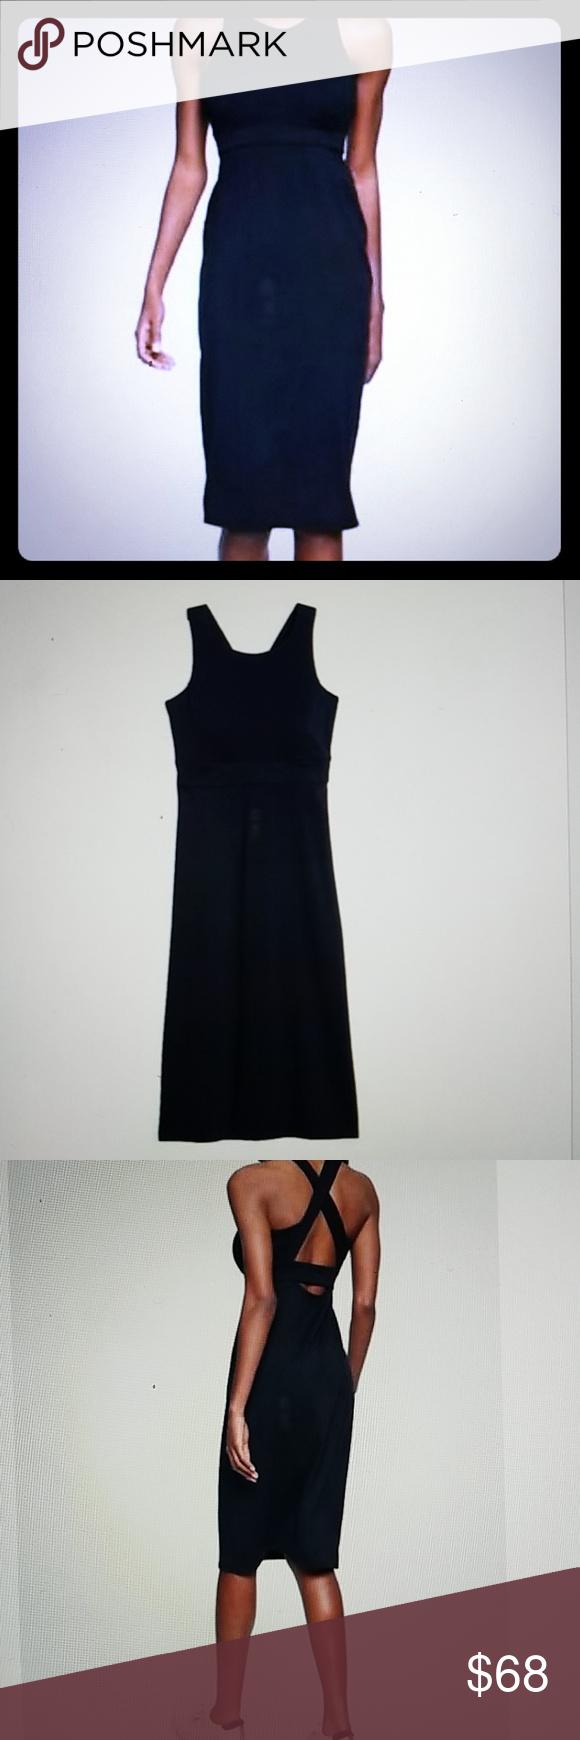 94e1cdc7529d8 Athleta Deep Breath Bralette Dress S LT Navy NWT   Athleta Deep Breath  Bralette Dress Navy